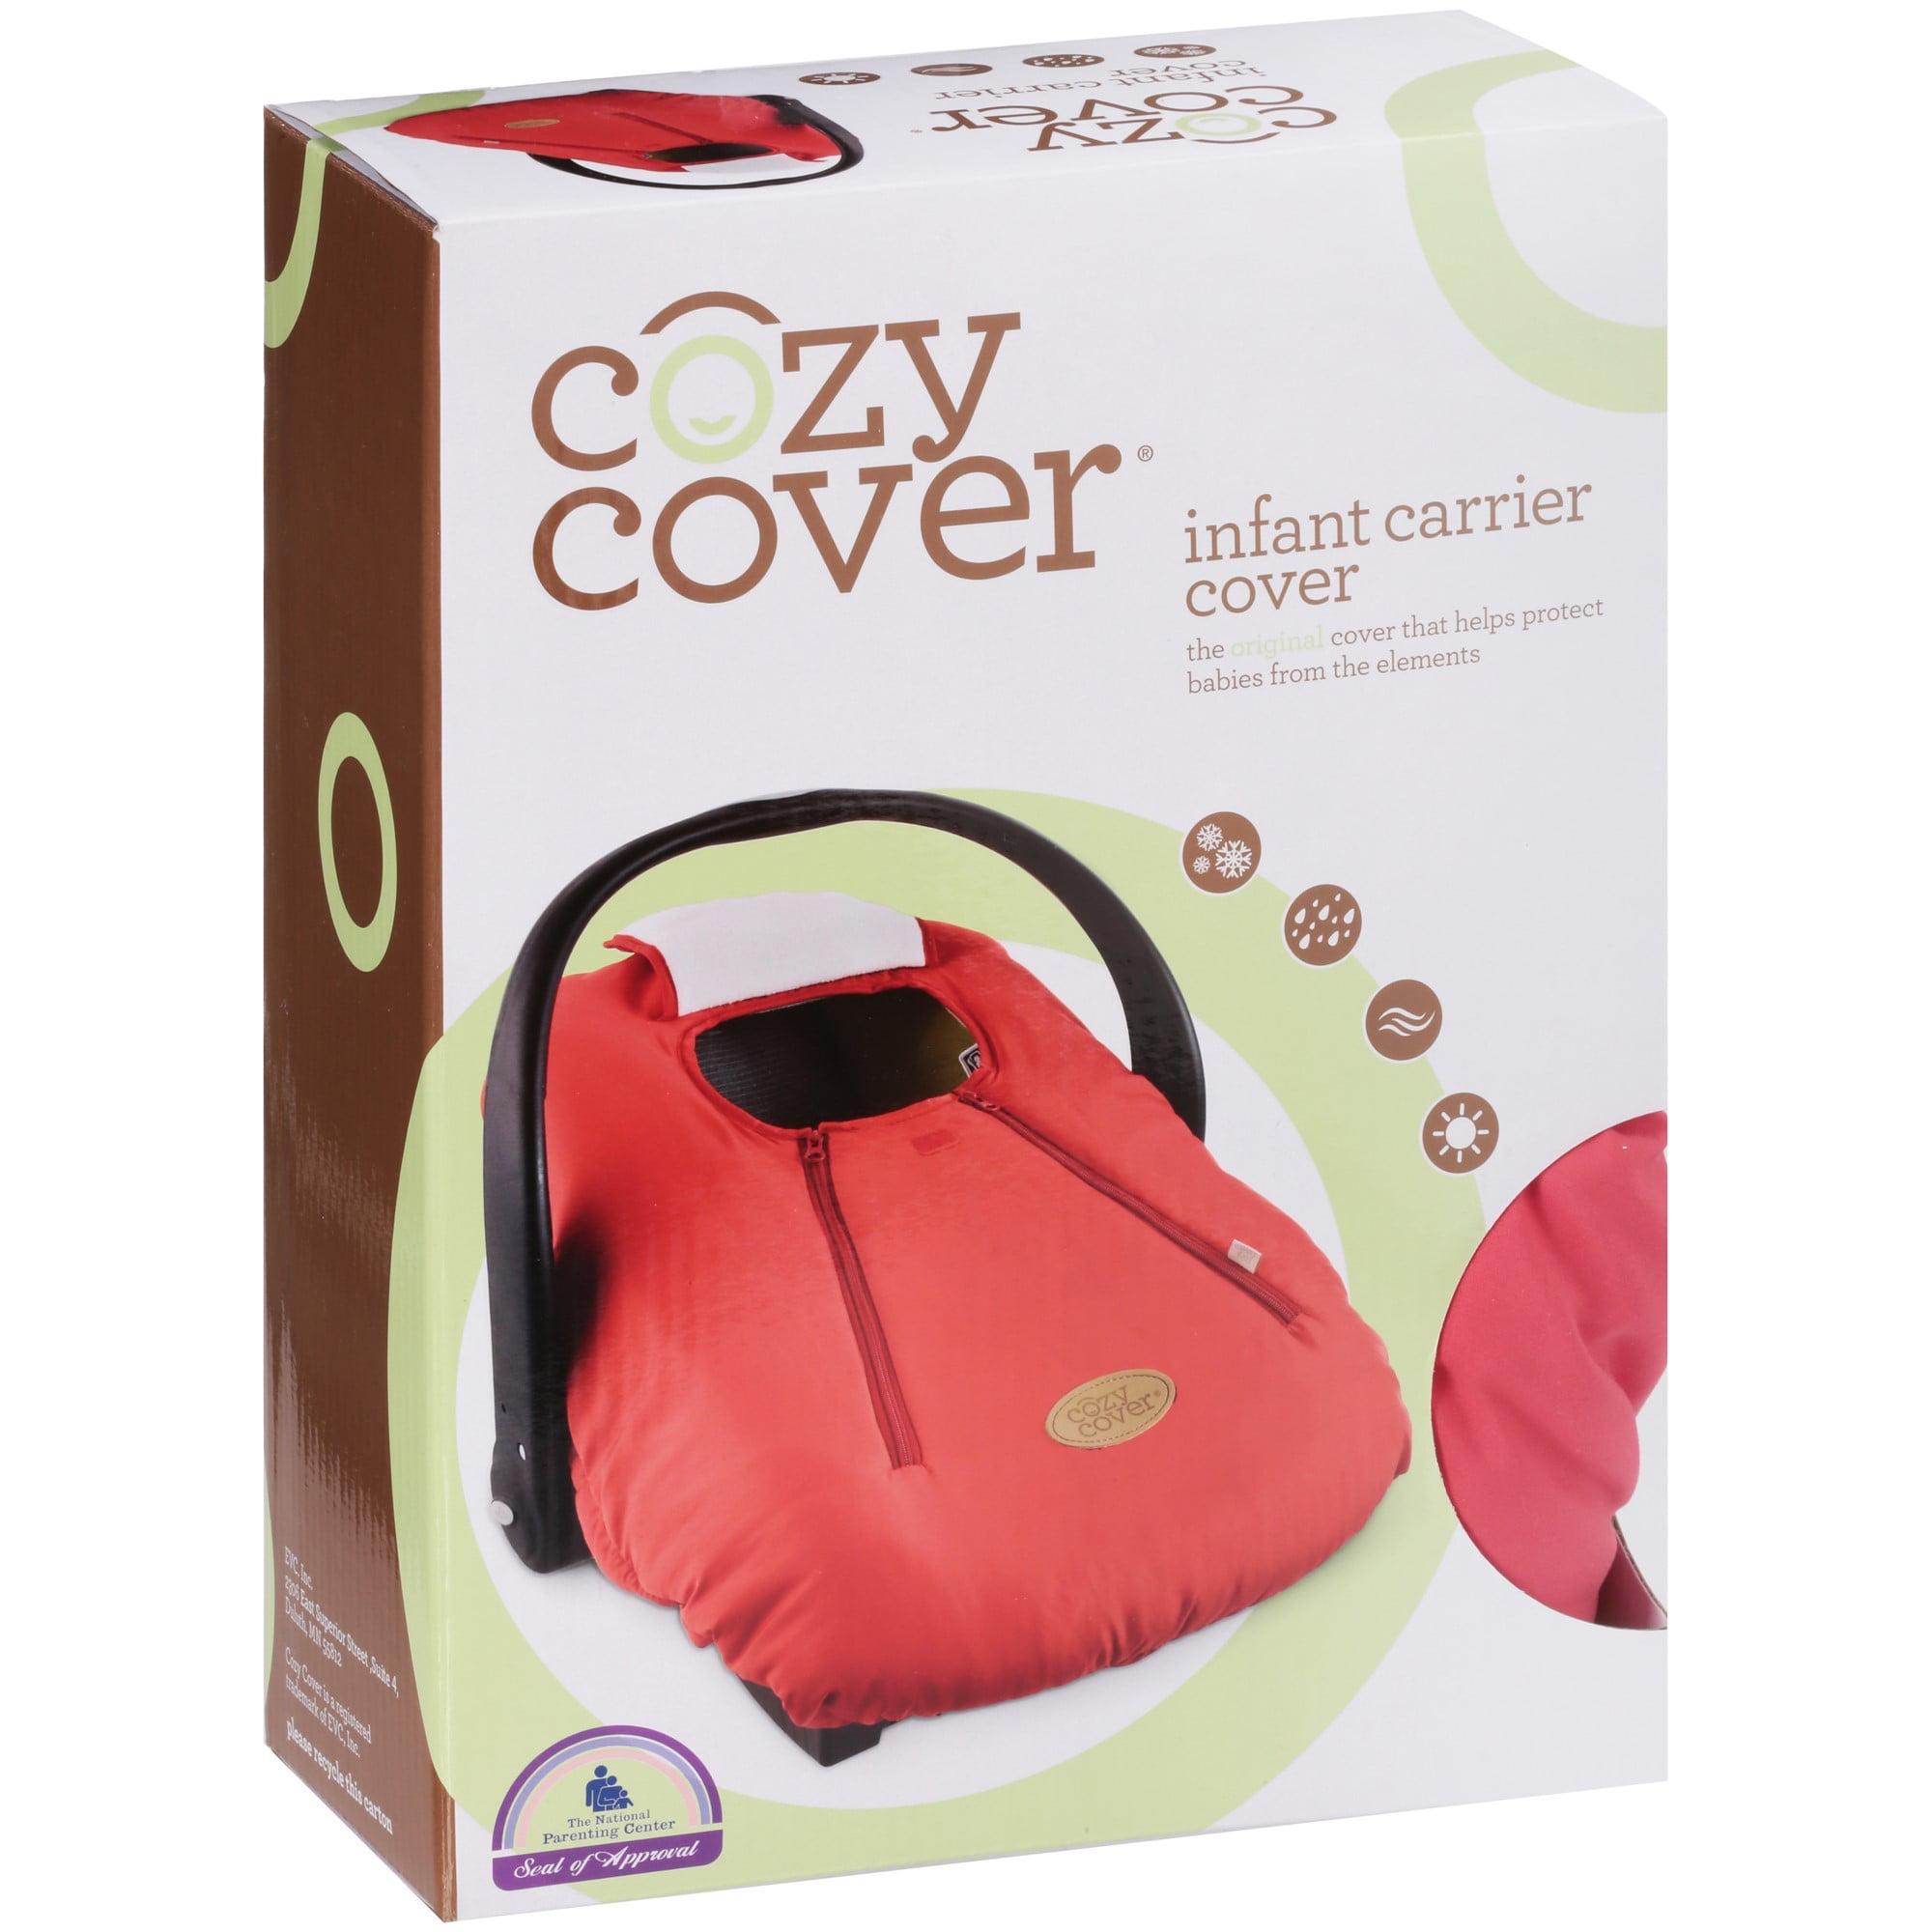 Miraculous Cozy Cover Infant Carrier Cover Cayenne Walmart Inventory Inzonedesignstudio Interior Chair Design Inzonedesignstudiocom